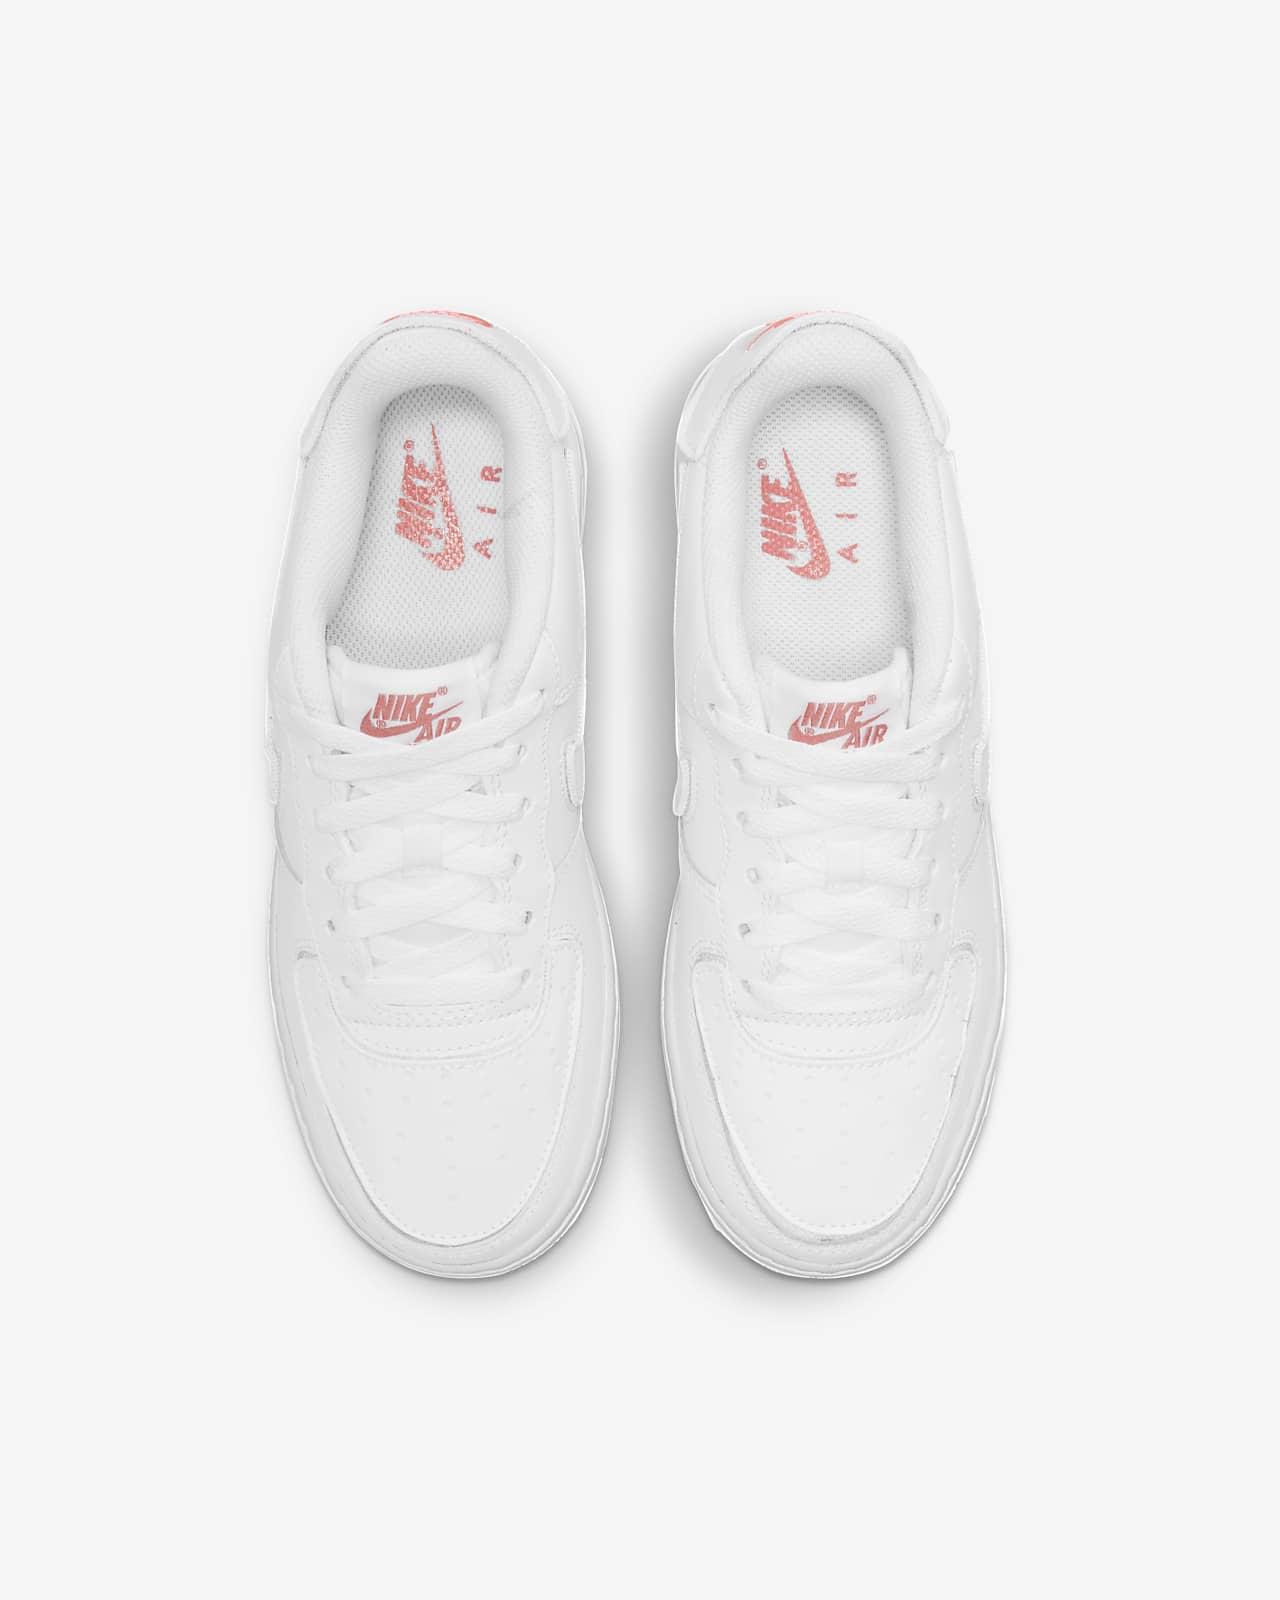 Nike Air Force 1/1 Big Kids' Shoes. Nike.com